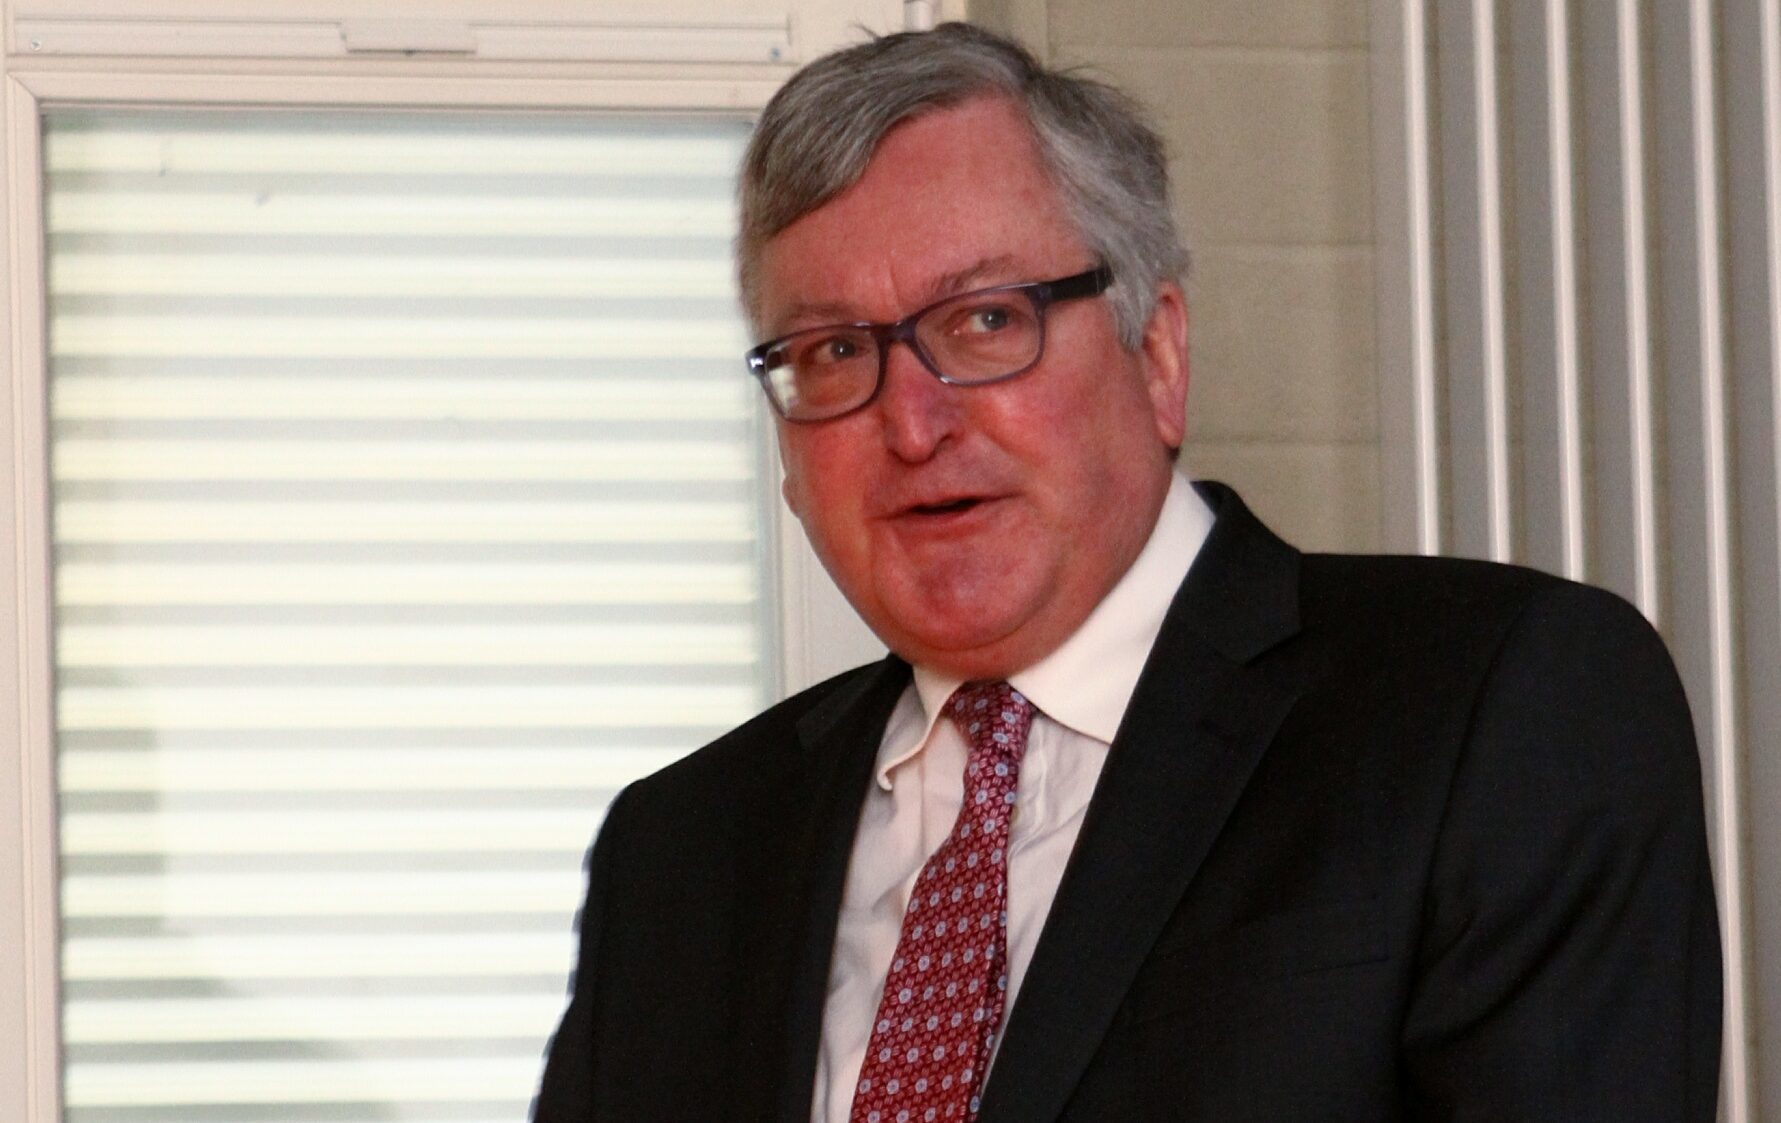 Rural economy minister Fergus Ewing